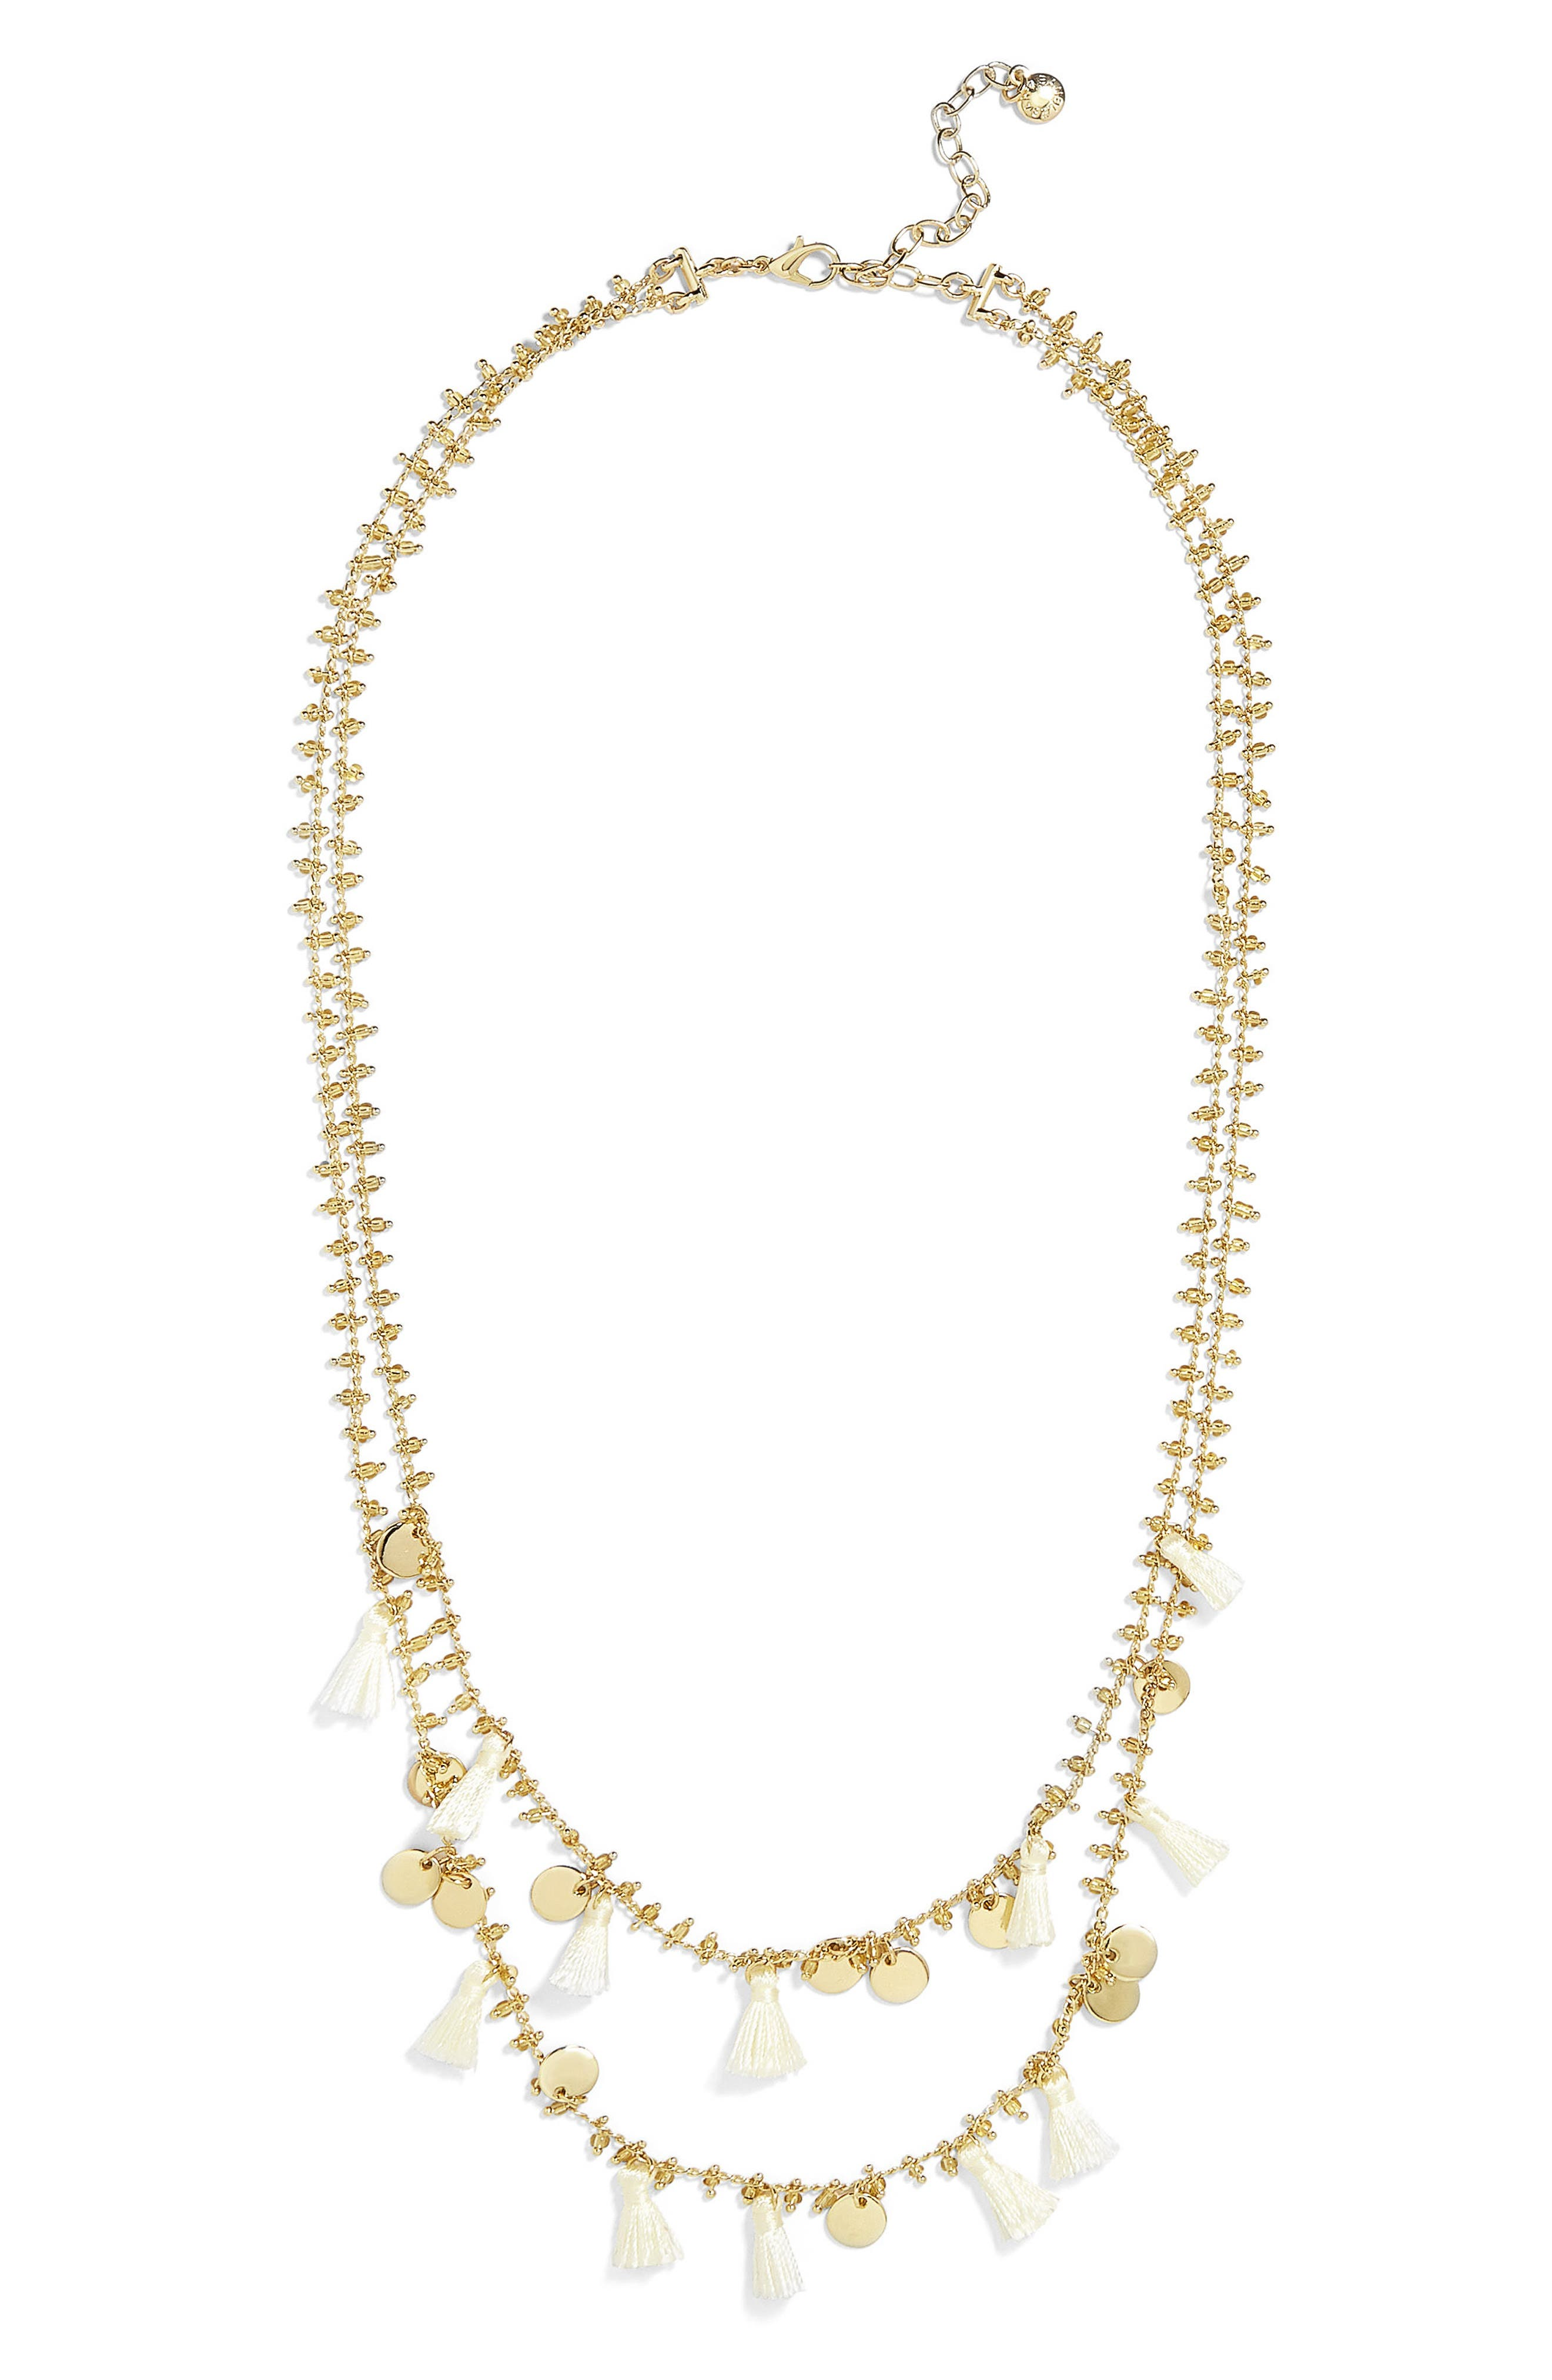 Kirana Mini Tassel Layered Necklace,                             Main thumbnail 1, color,                             251